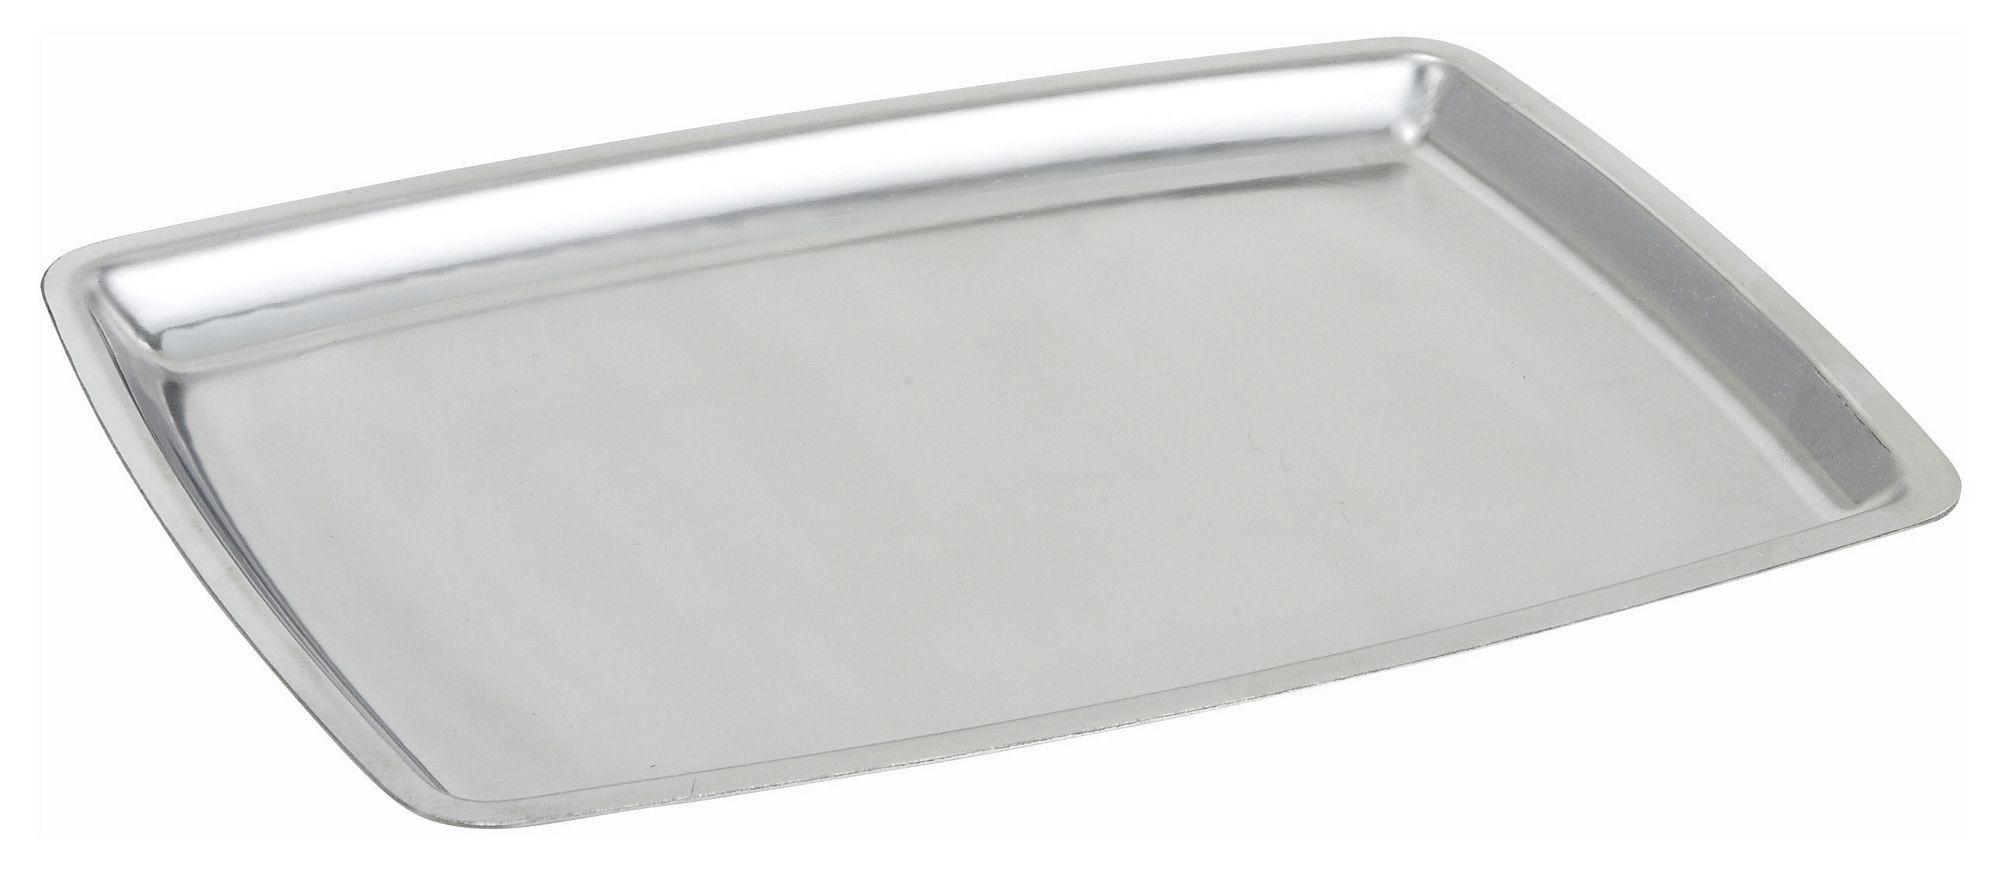 "Winco SIZ-11B Stainless Steel Oblong Sizzling Platter Only, 11"""